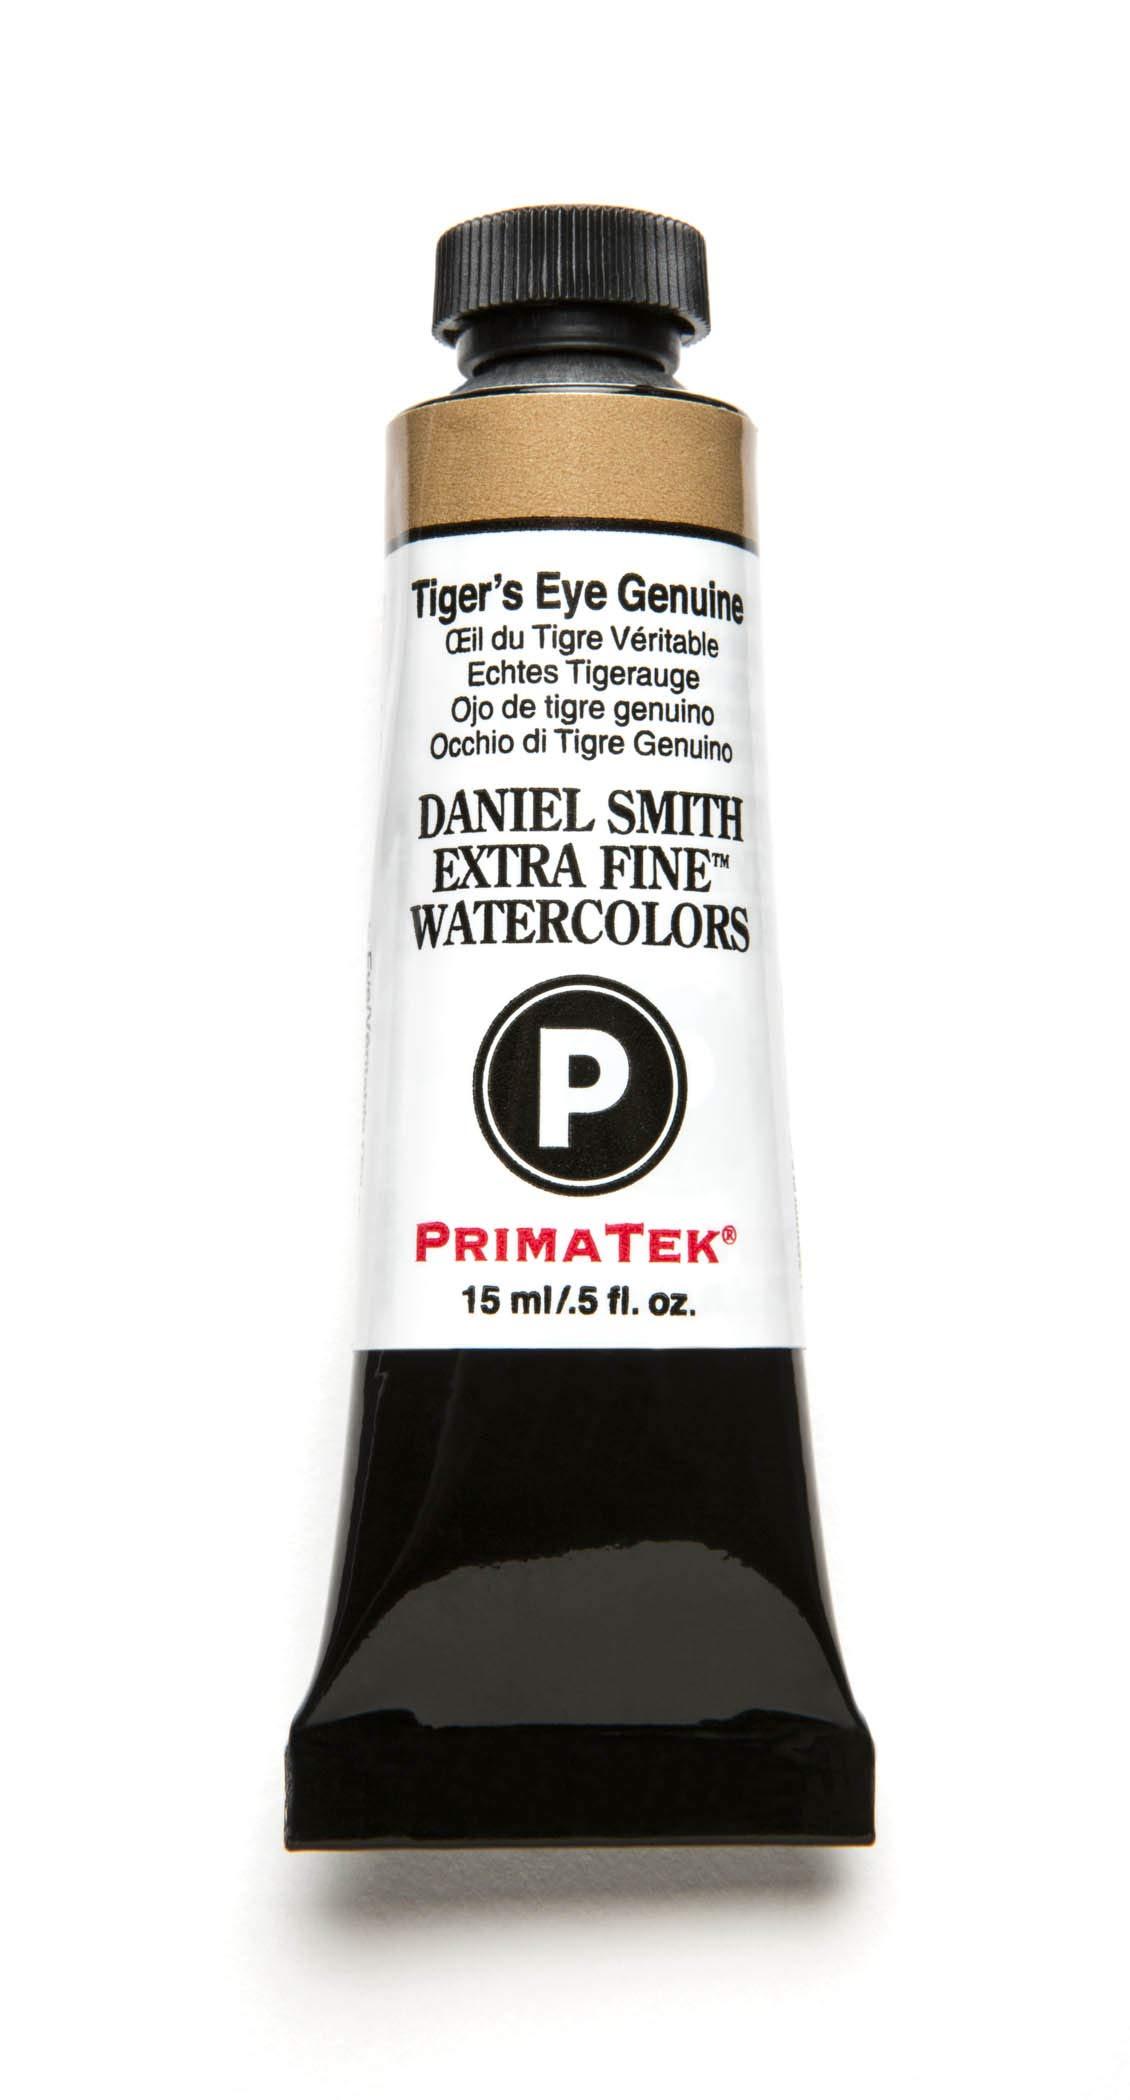 Daniel Smith Watercolour 15ml Tube (S2) - Tiger's Eye Genuine (0161)